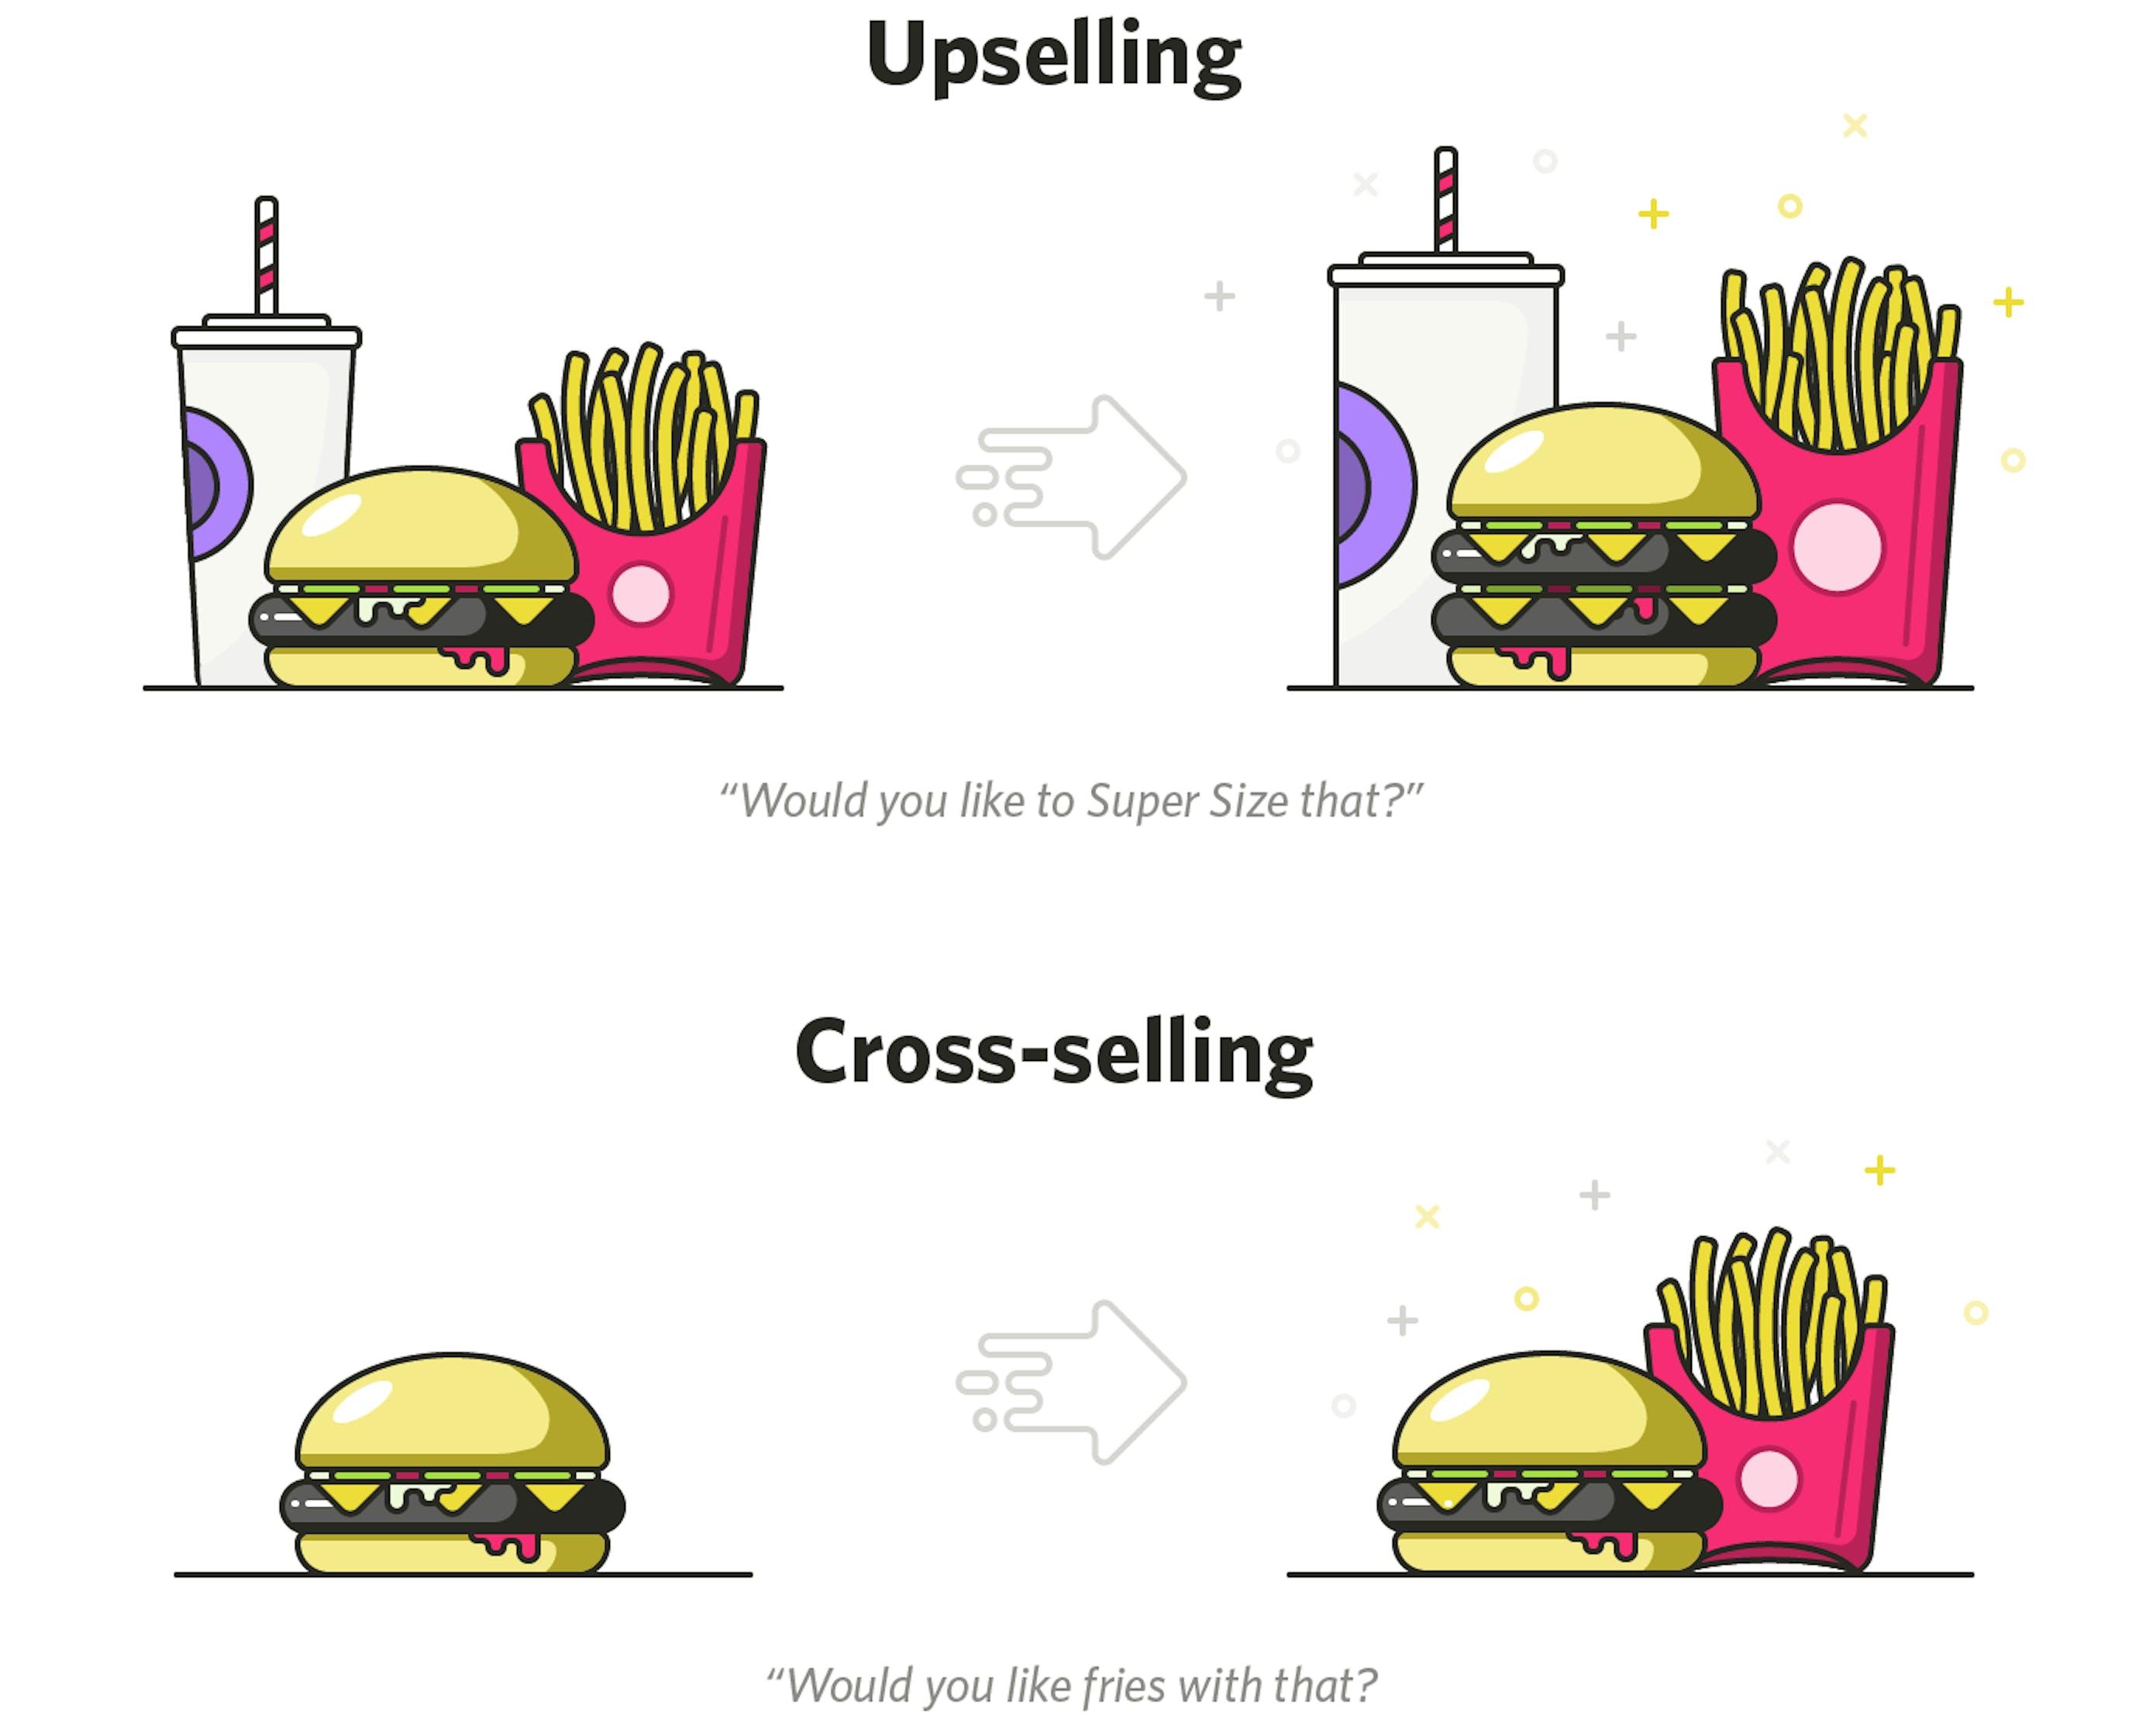 cross-selling vs. upselling